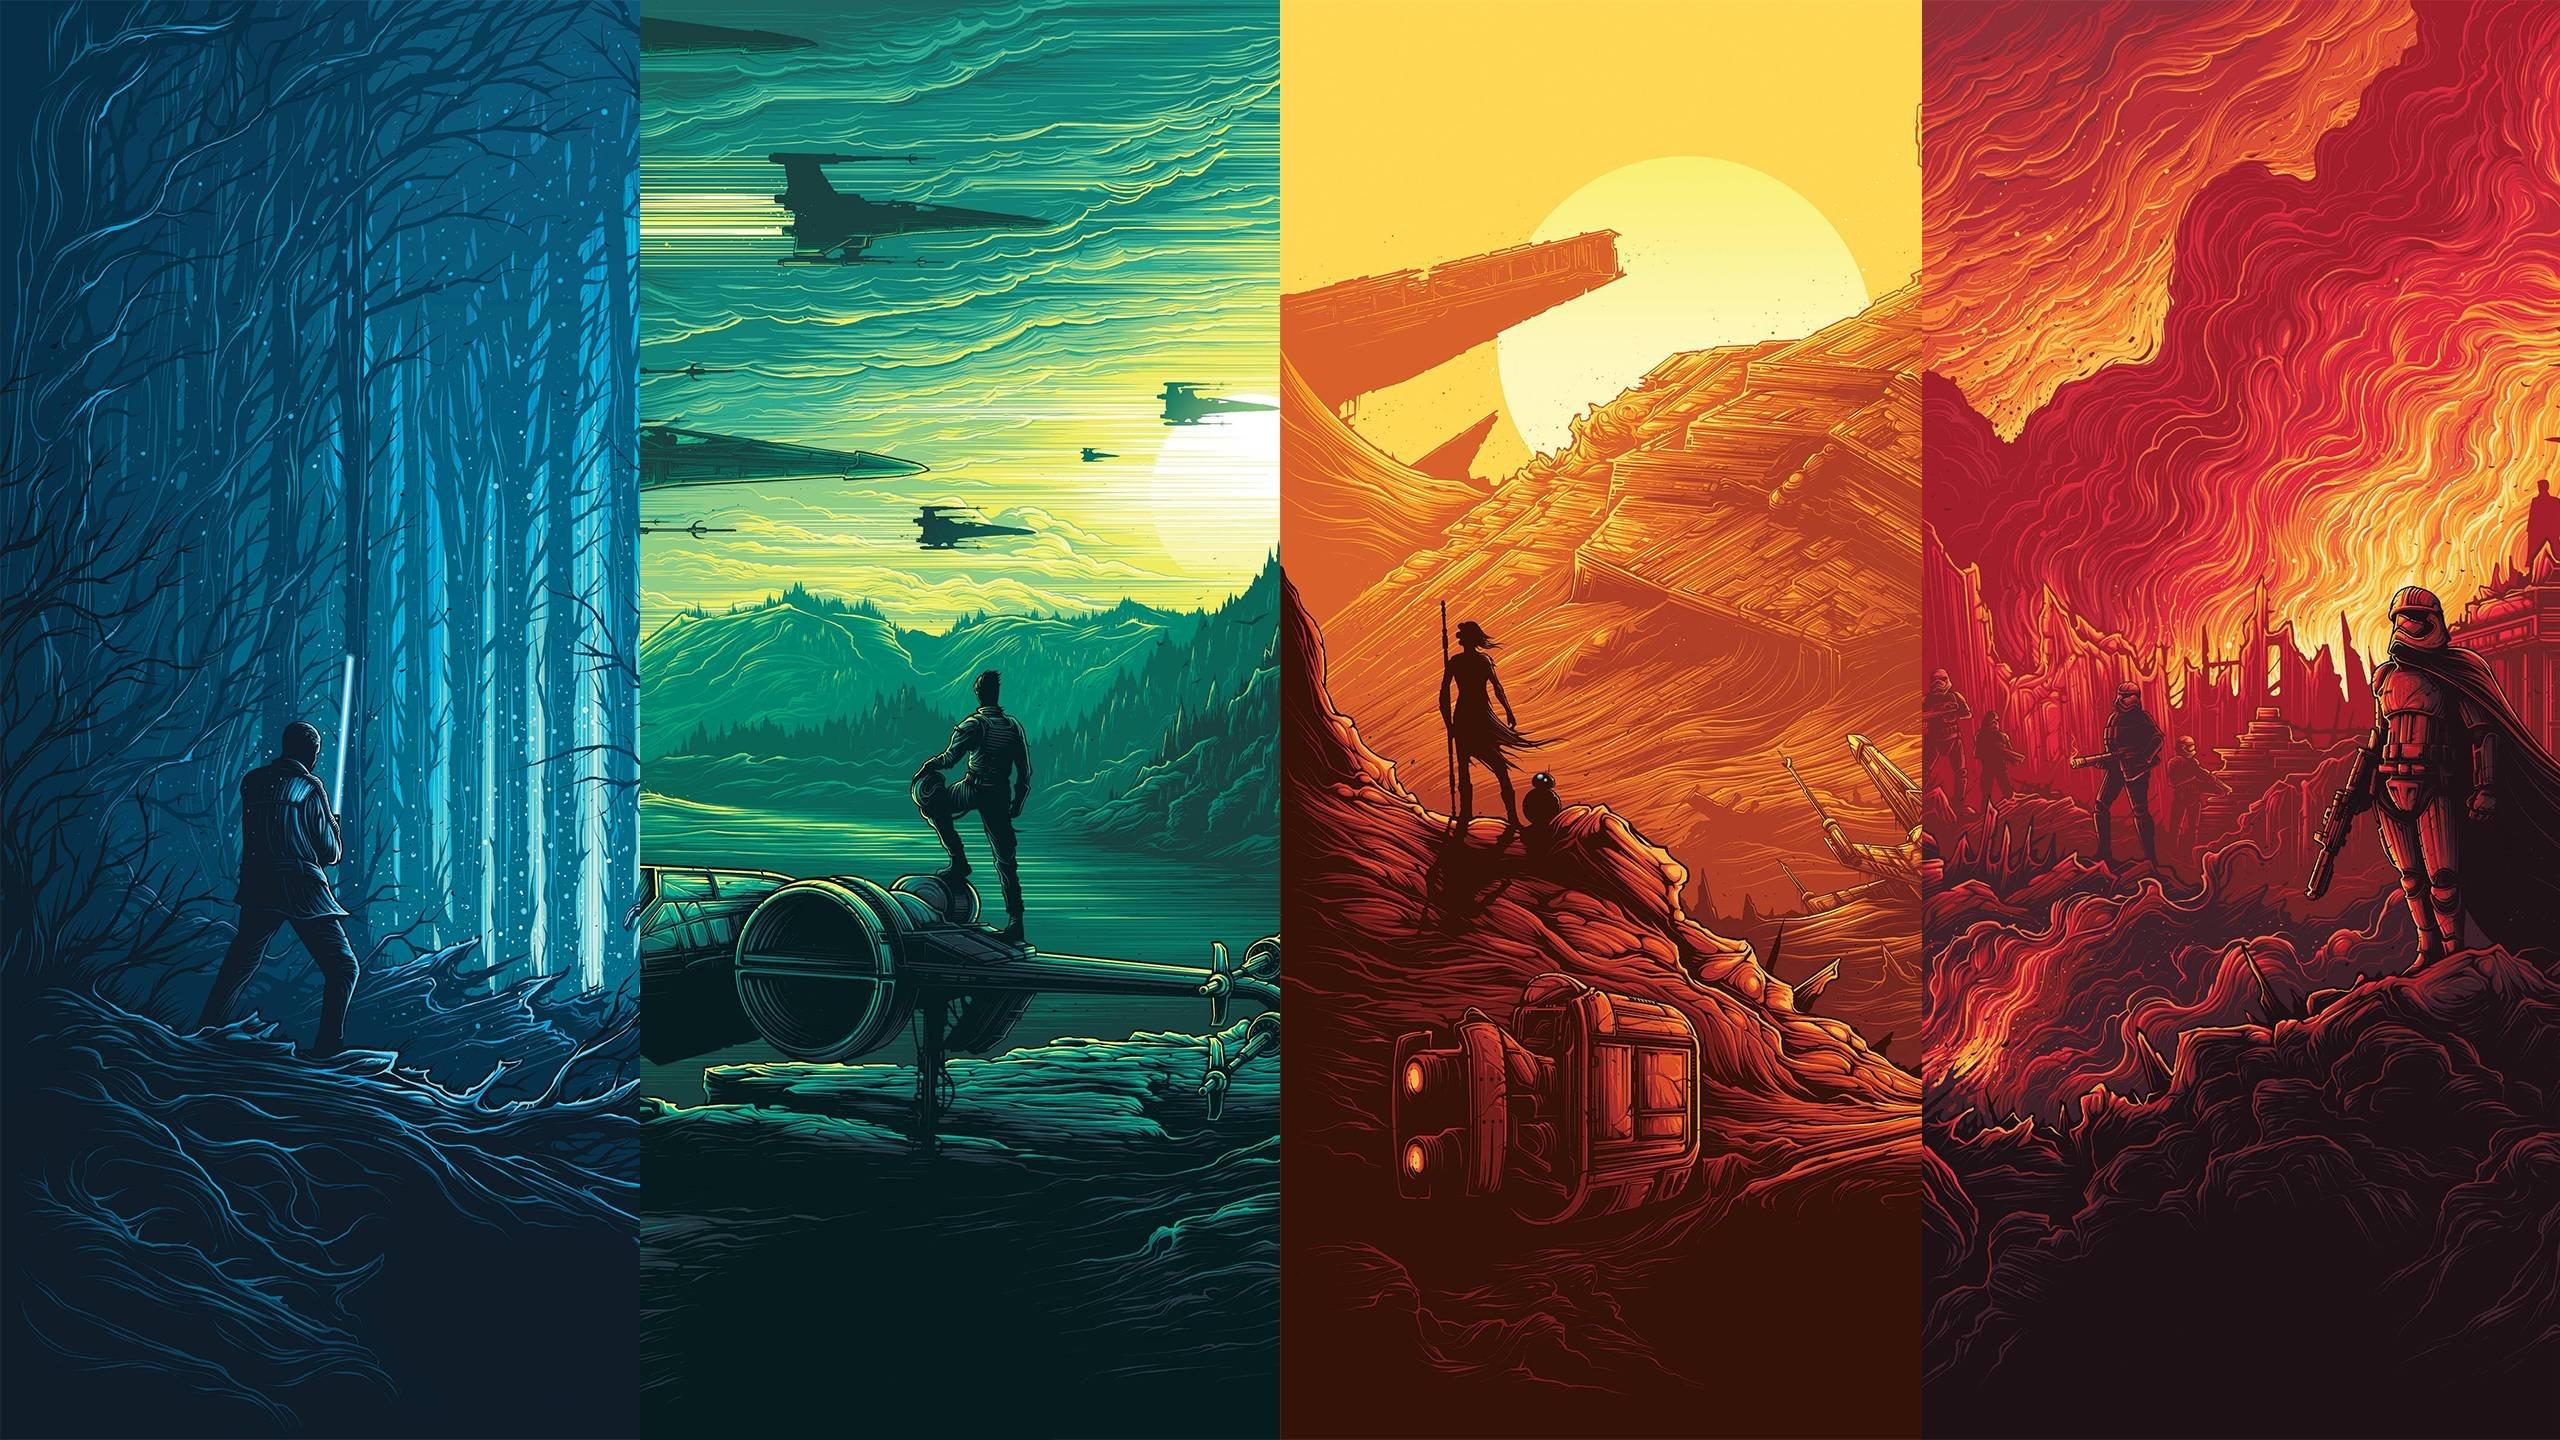 Star Wars Force Awakens Posters Hd Wallpaper